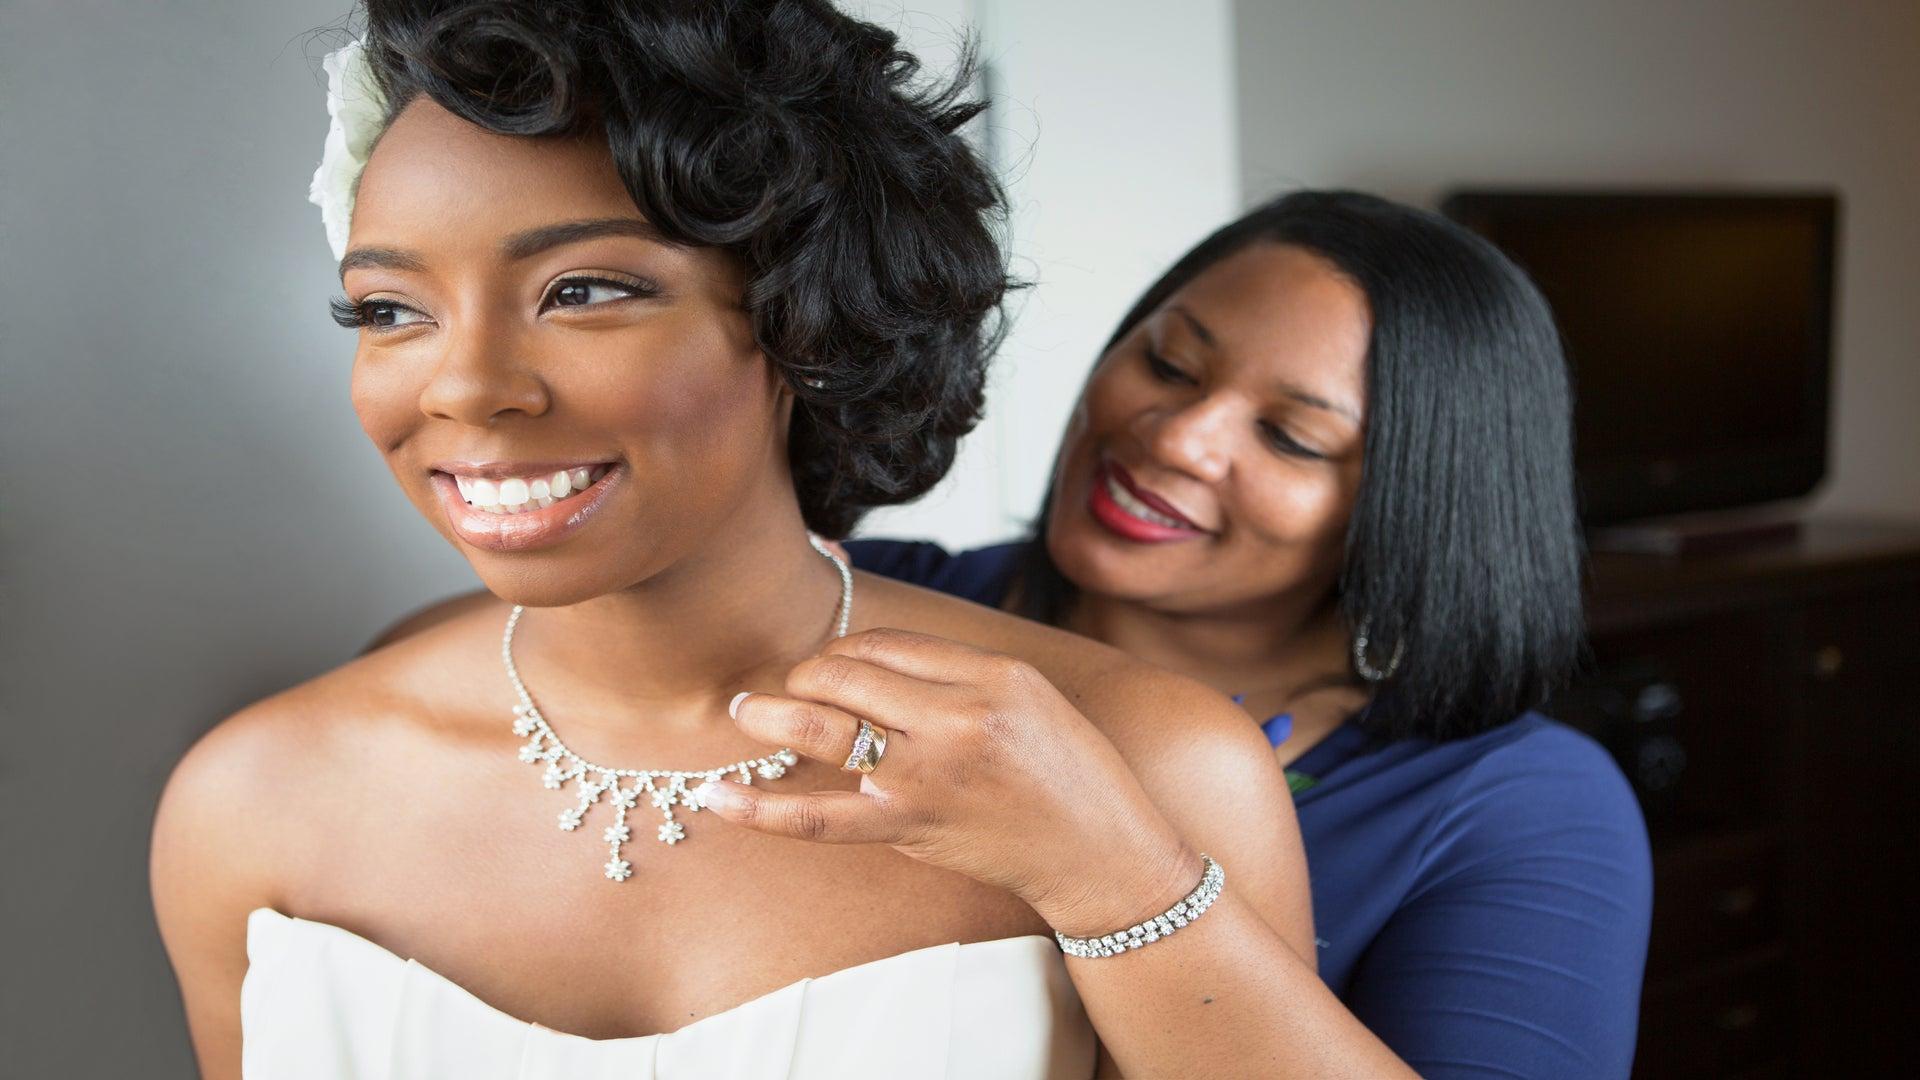 Your Pre-Wedding Beauty Timeline